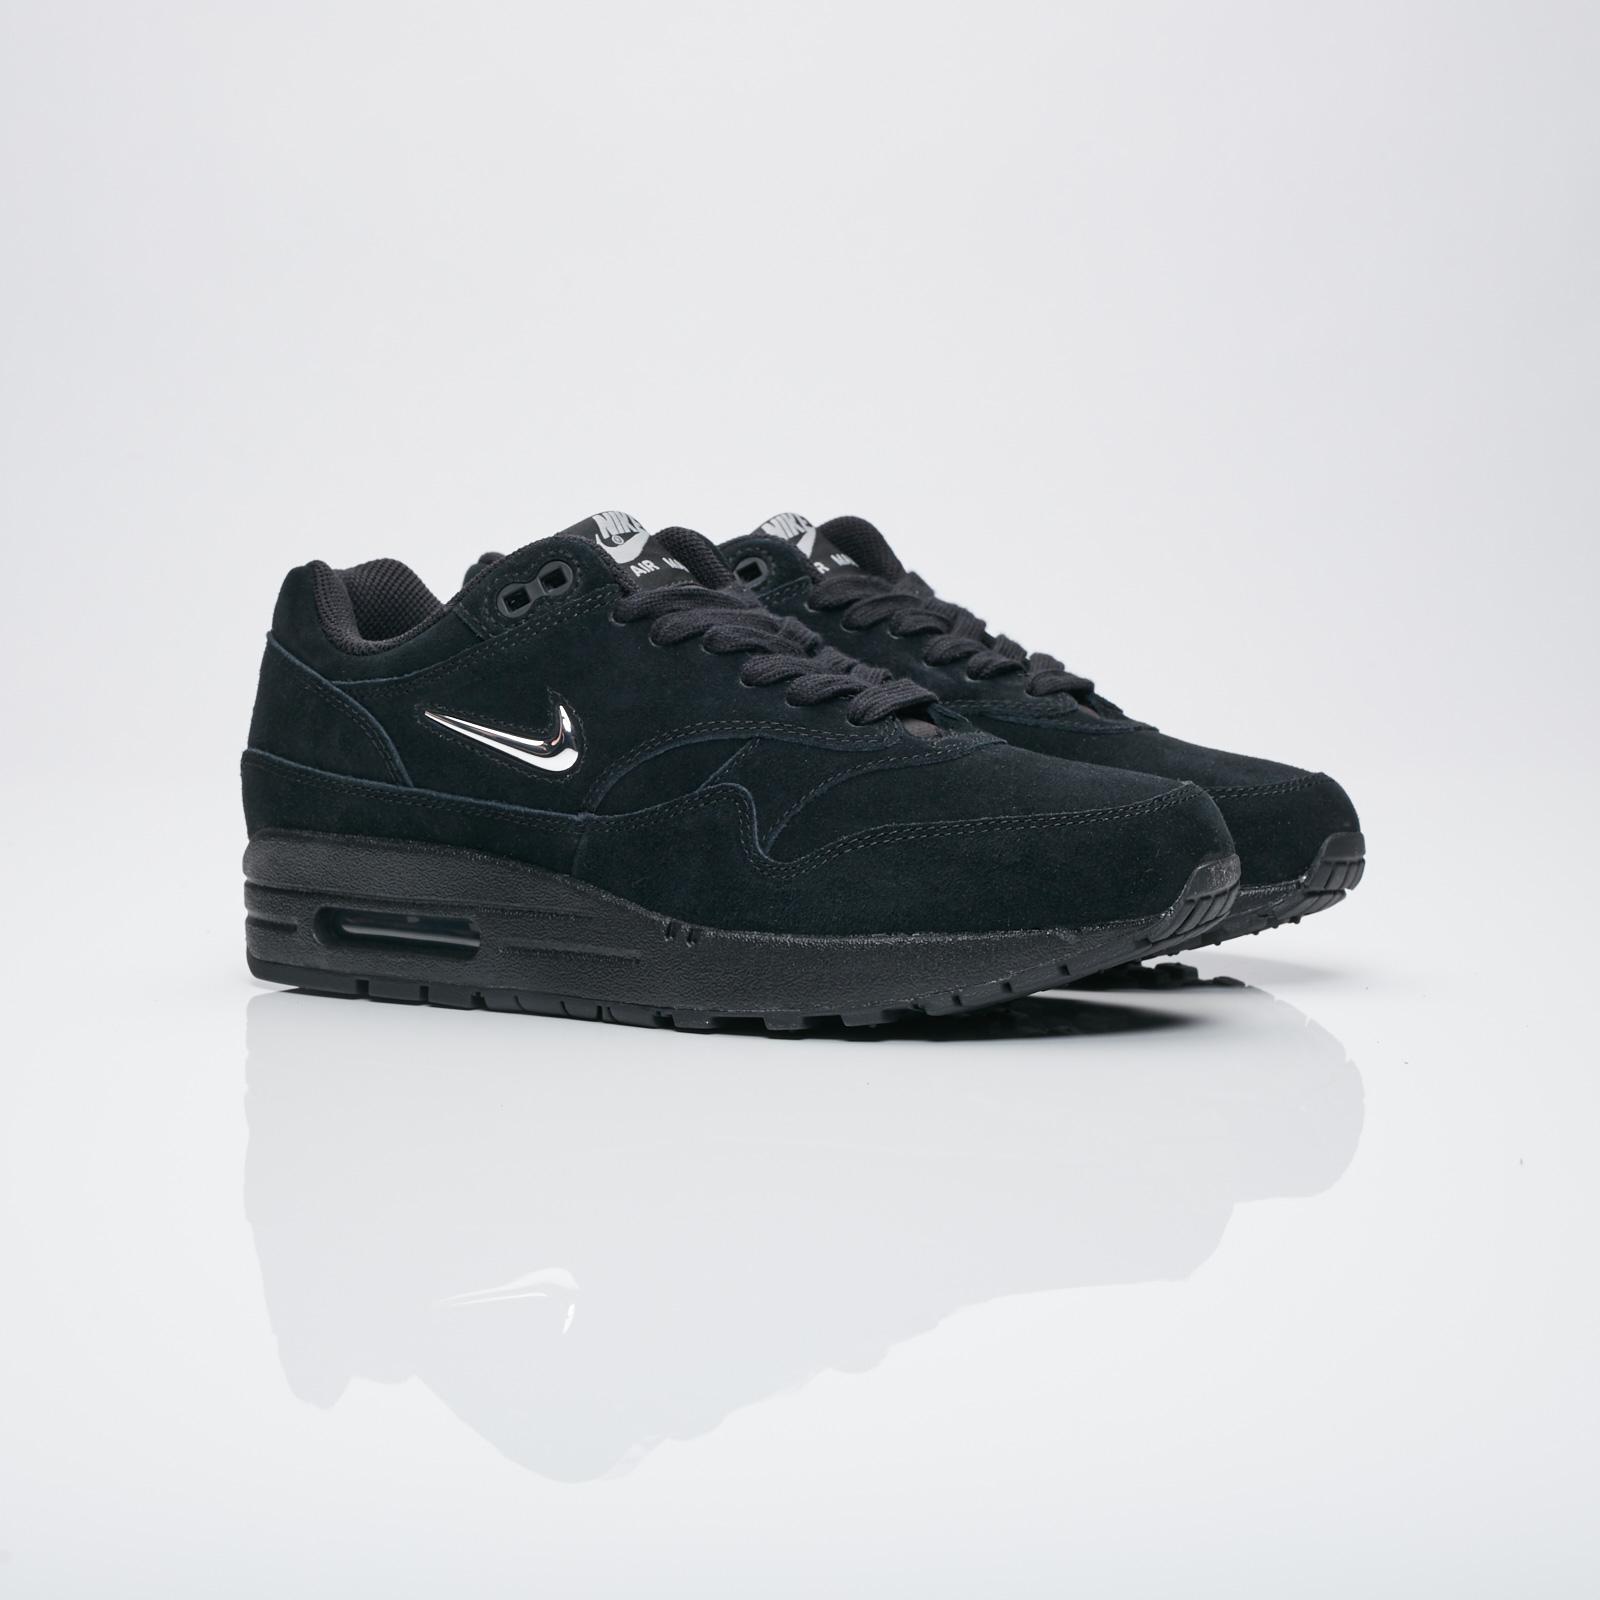 official photos 8f389 4dc9b promo code for nike air max 1 premium sc black wolf grey metallic silver  womens lifestyle shoes qpslof 7876c 8cfa9  best nike sportswear wmns air  max 1 ...